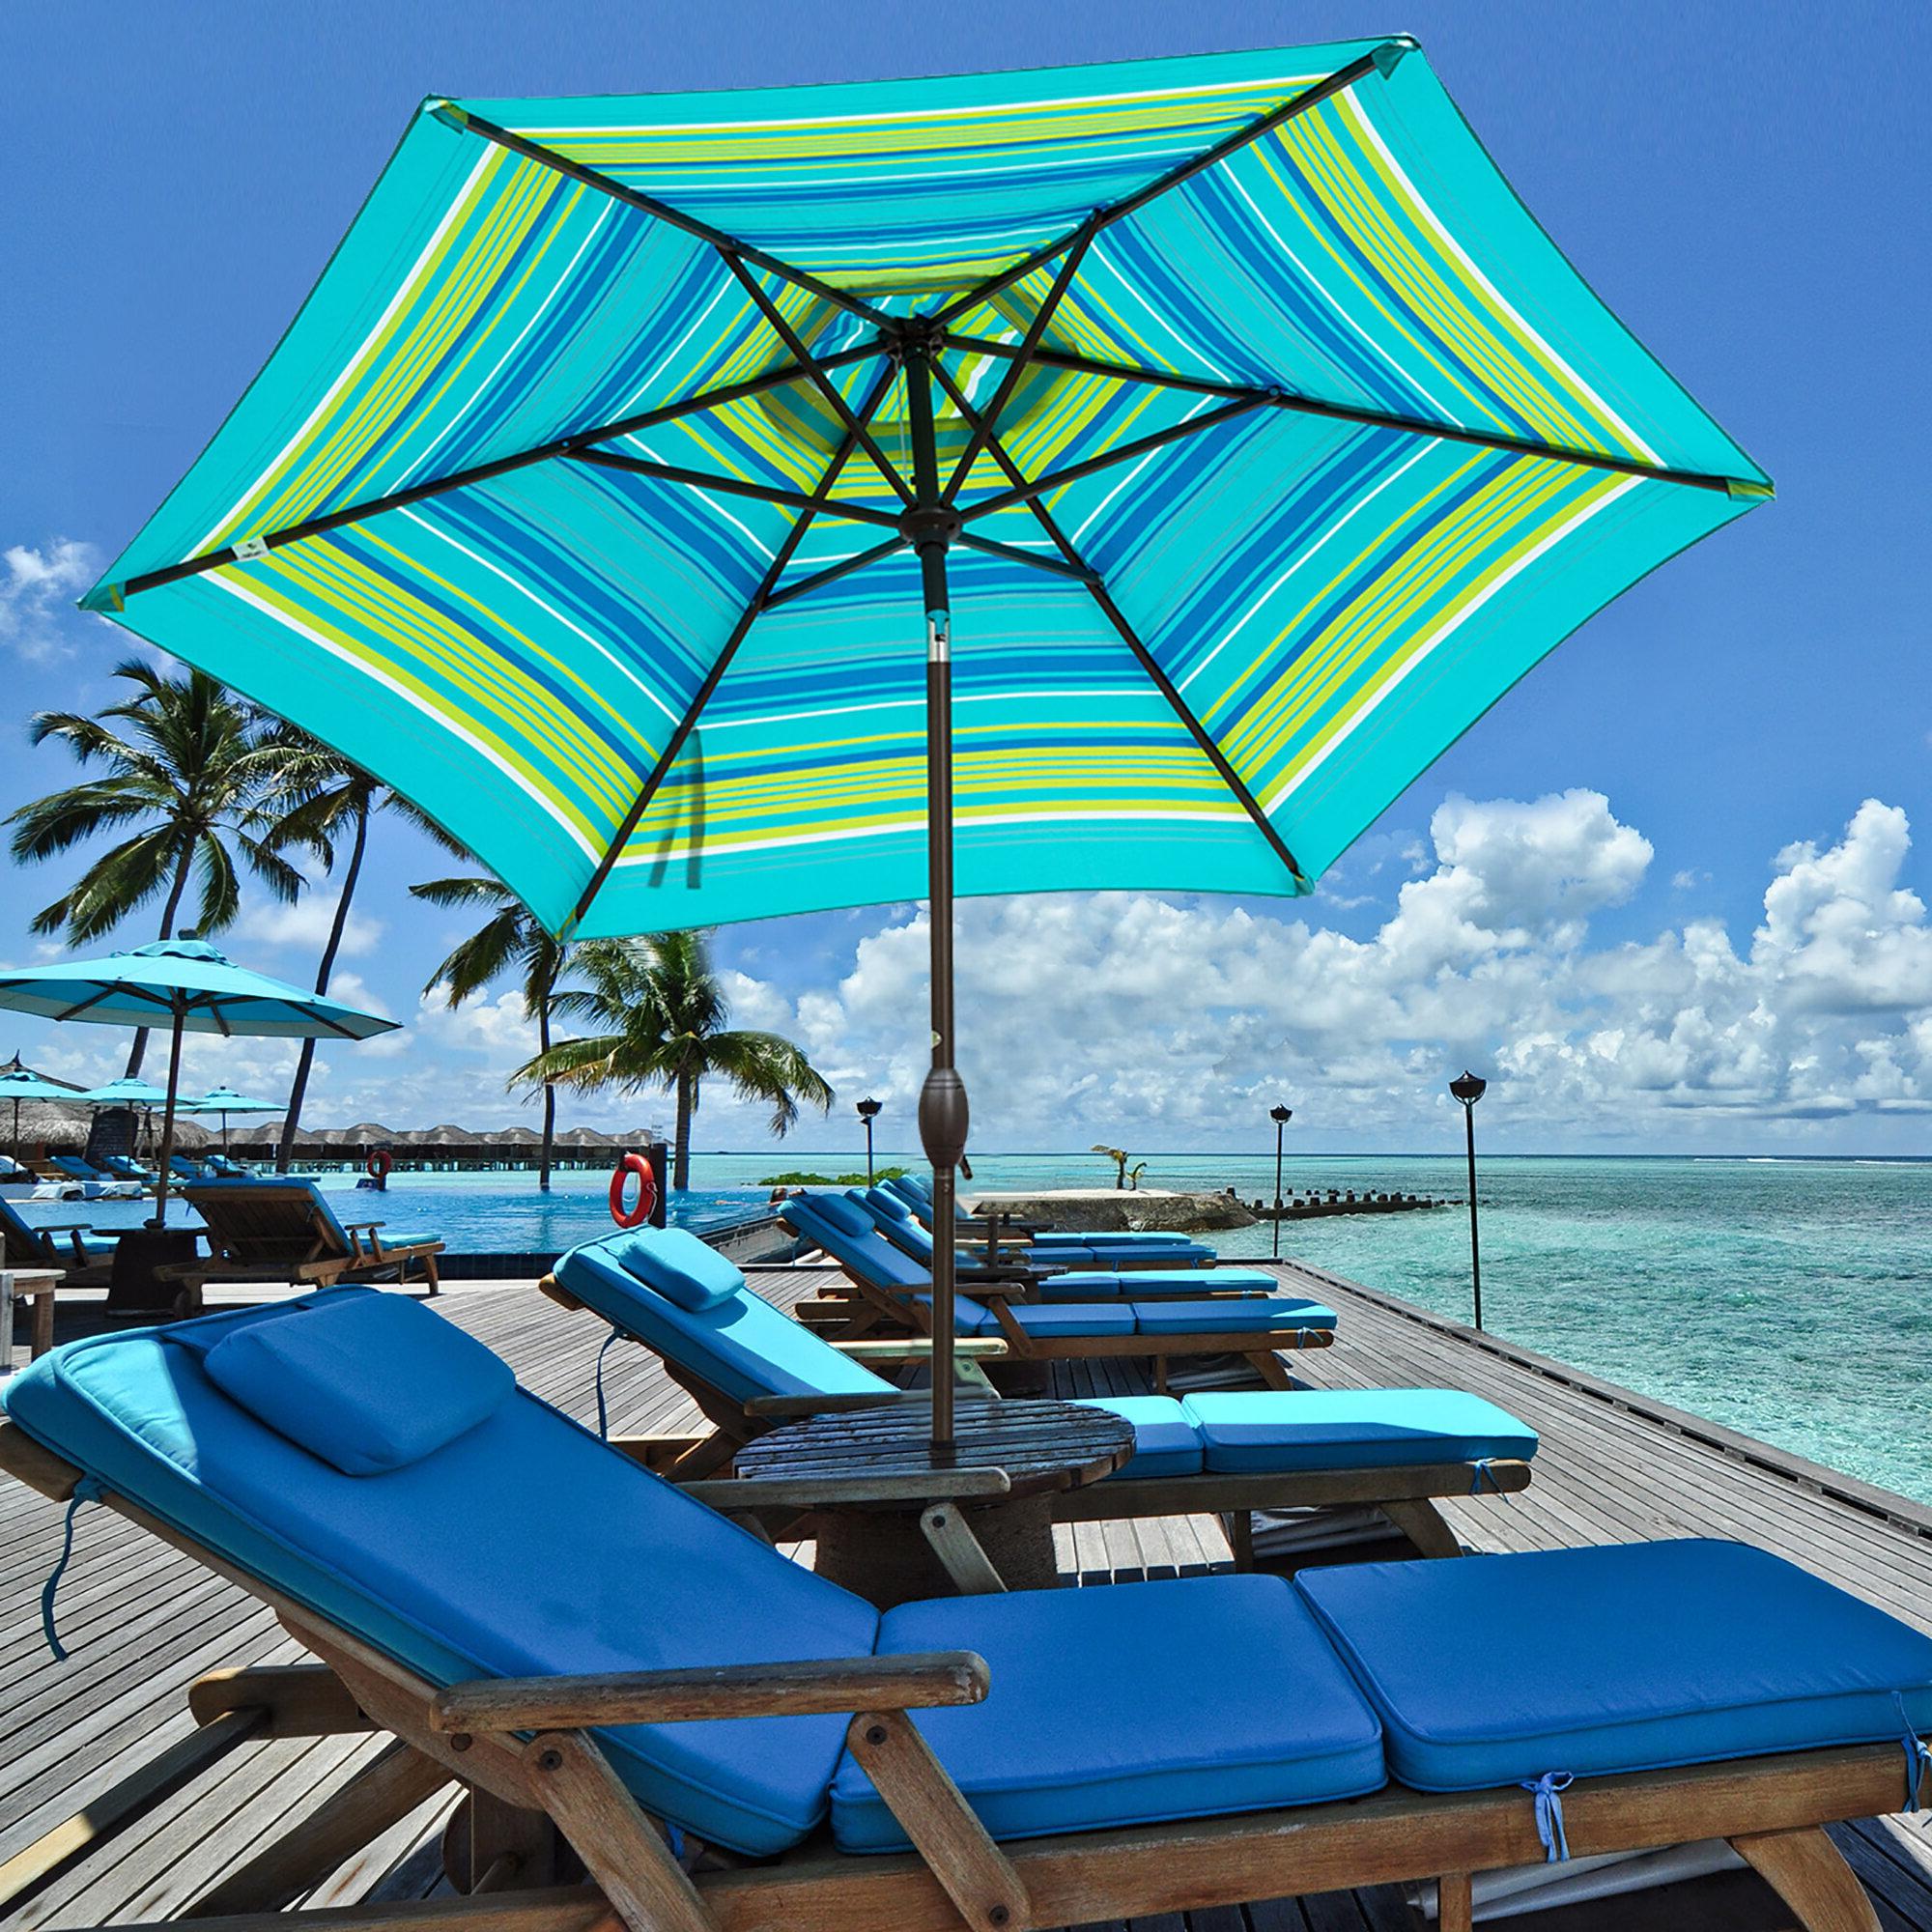 Flitwick 9' Market Umbrella With Regard To 2020 Filey Market Umbrellas (View 12 of 20)